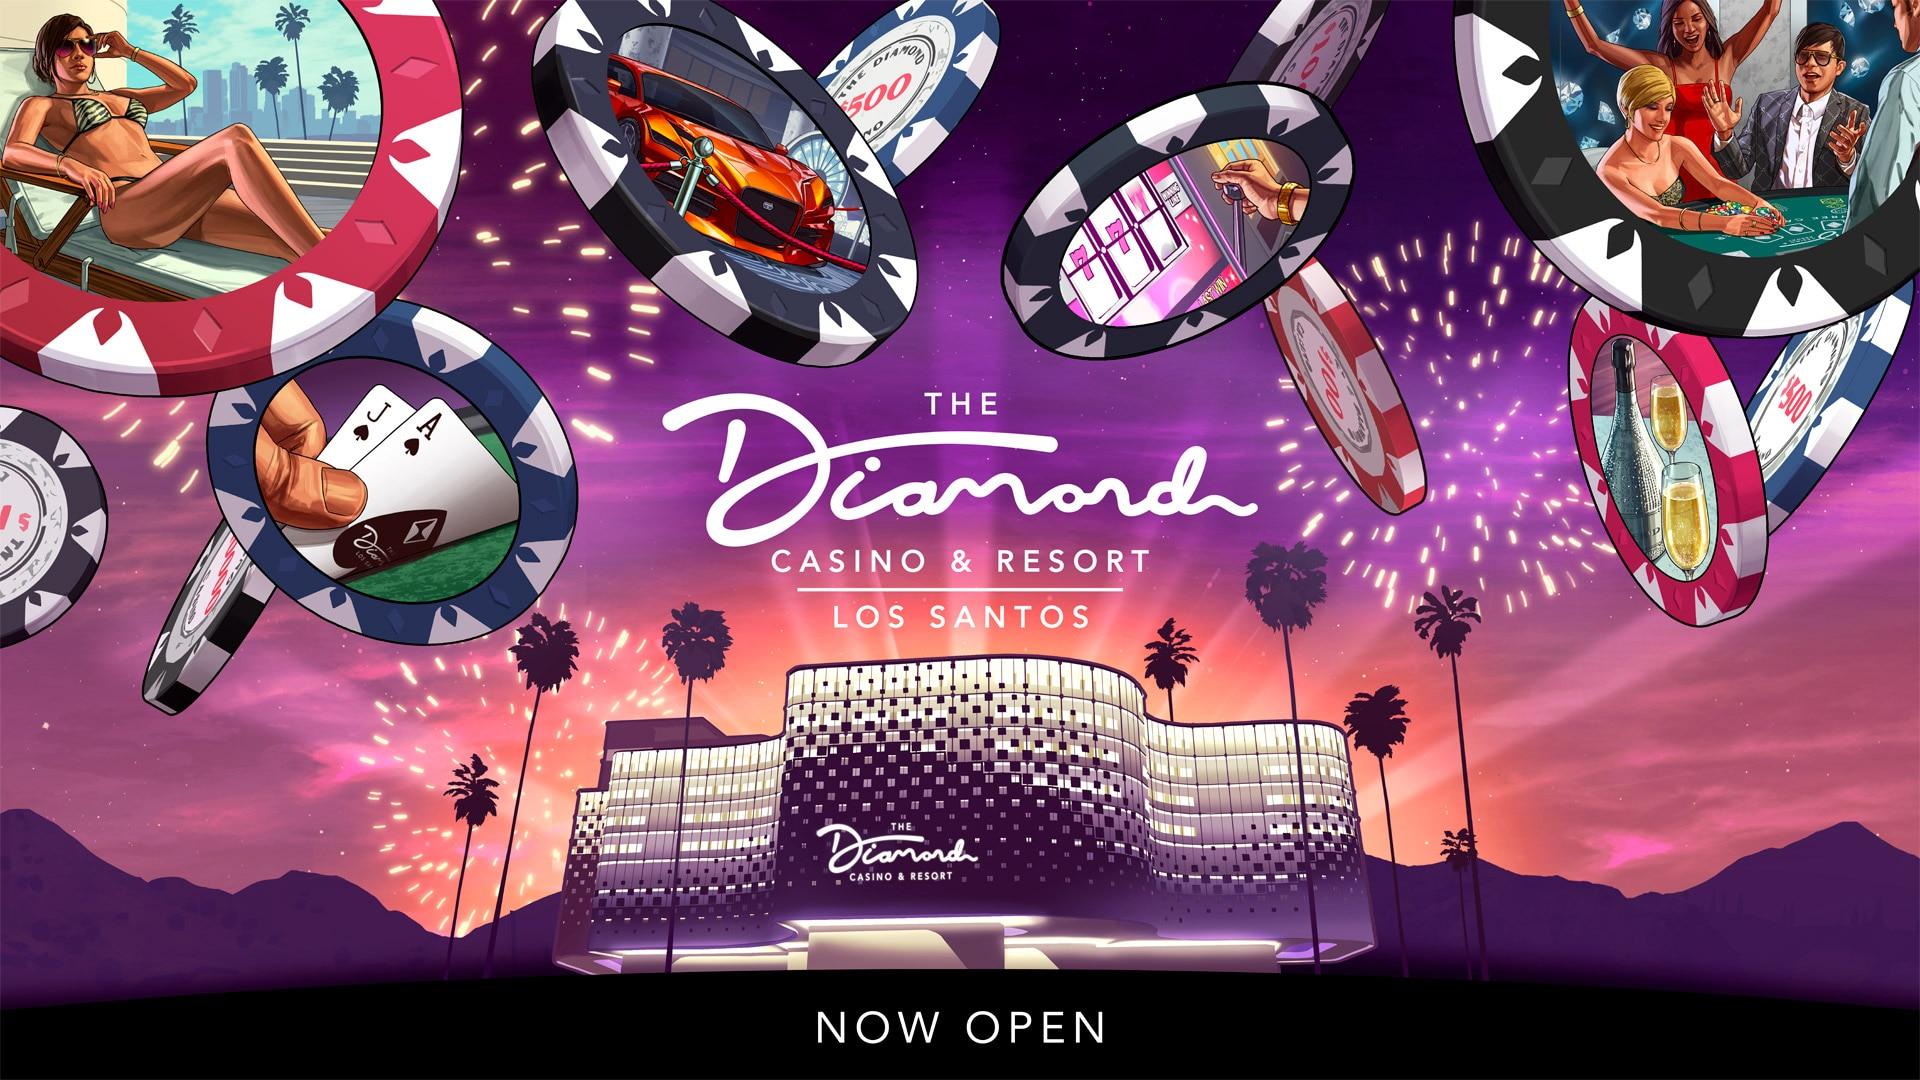 Grand Opening: The Diamond Casino & Resort is Now Open